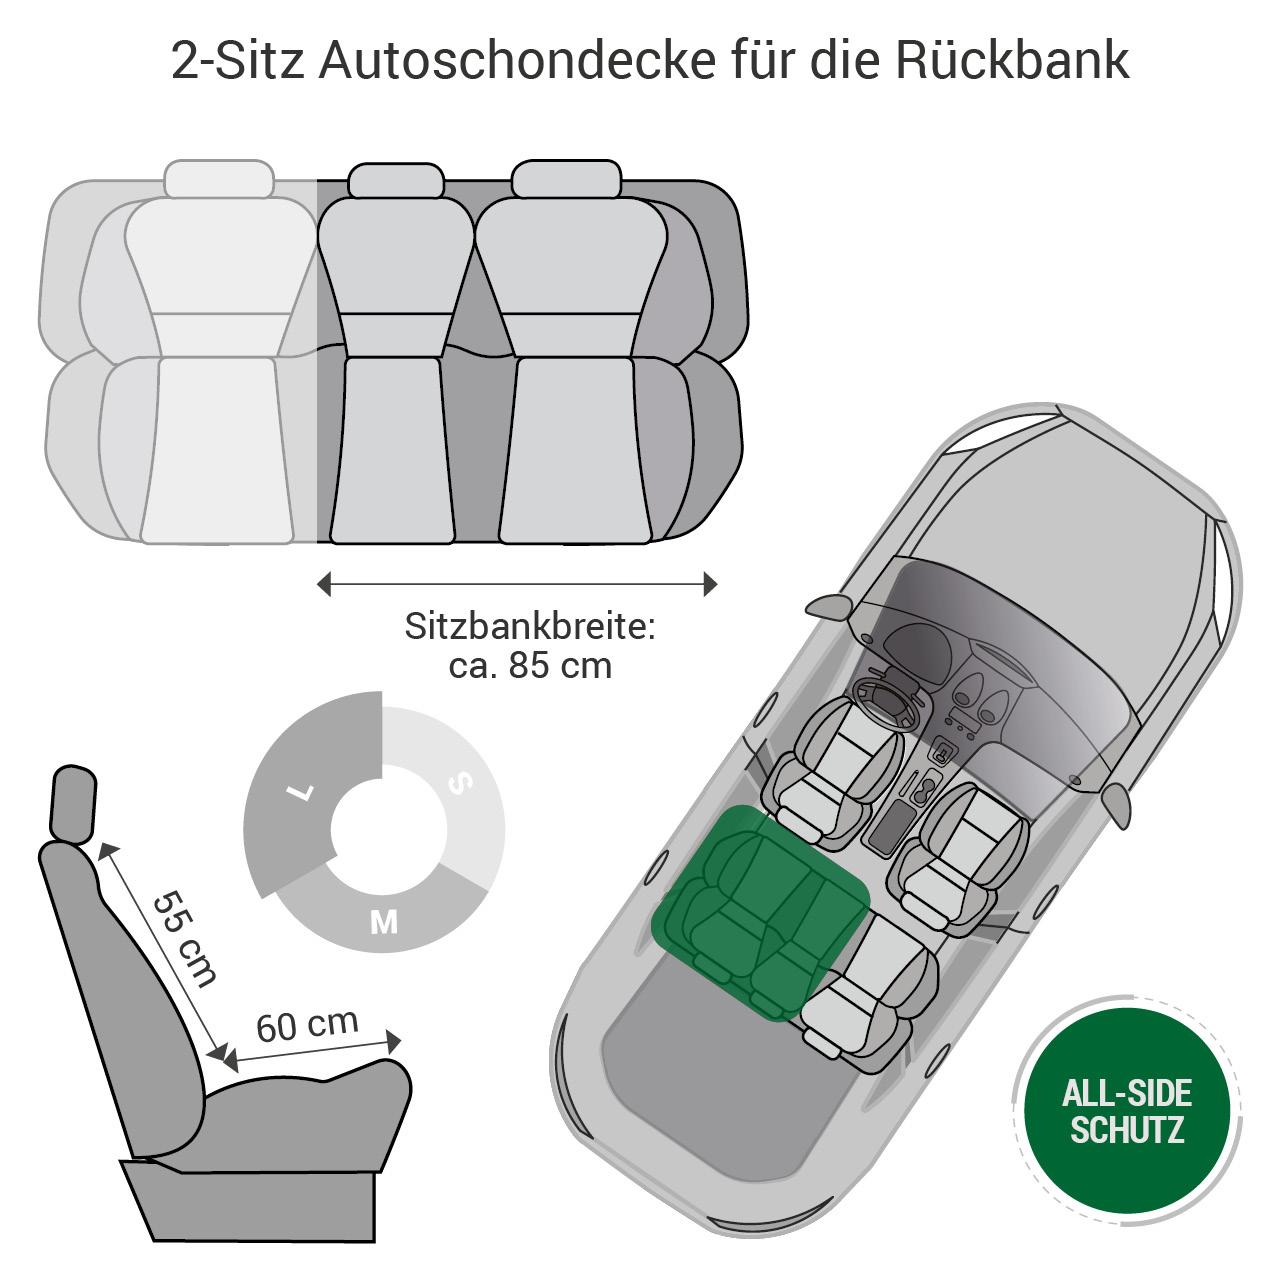 Doctor Bark - Autoschondecke für Hunde - Rückbank 2-Sitz Gr. L - schwarz